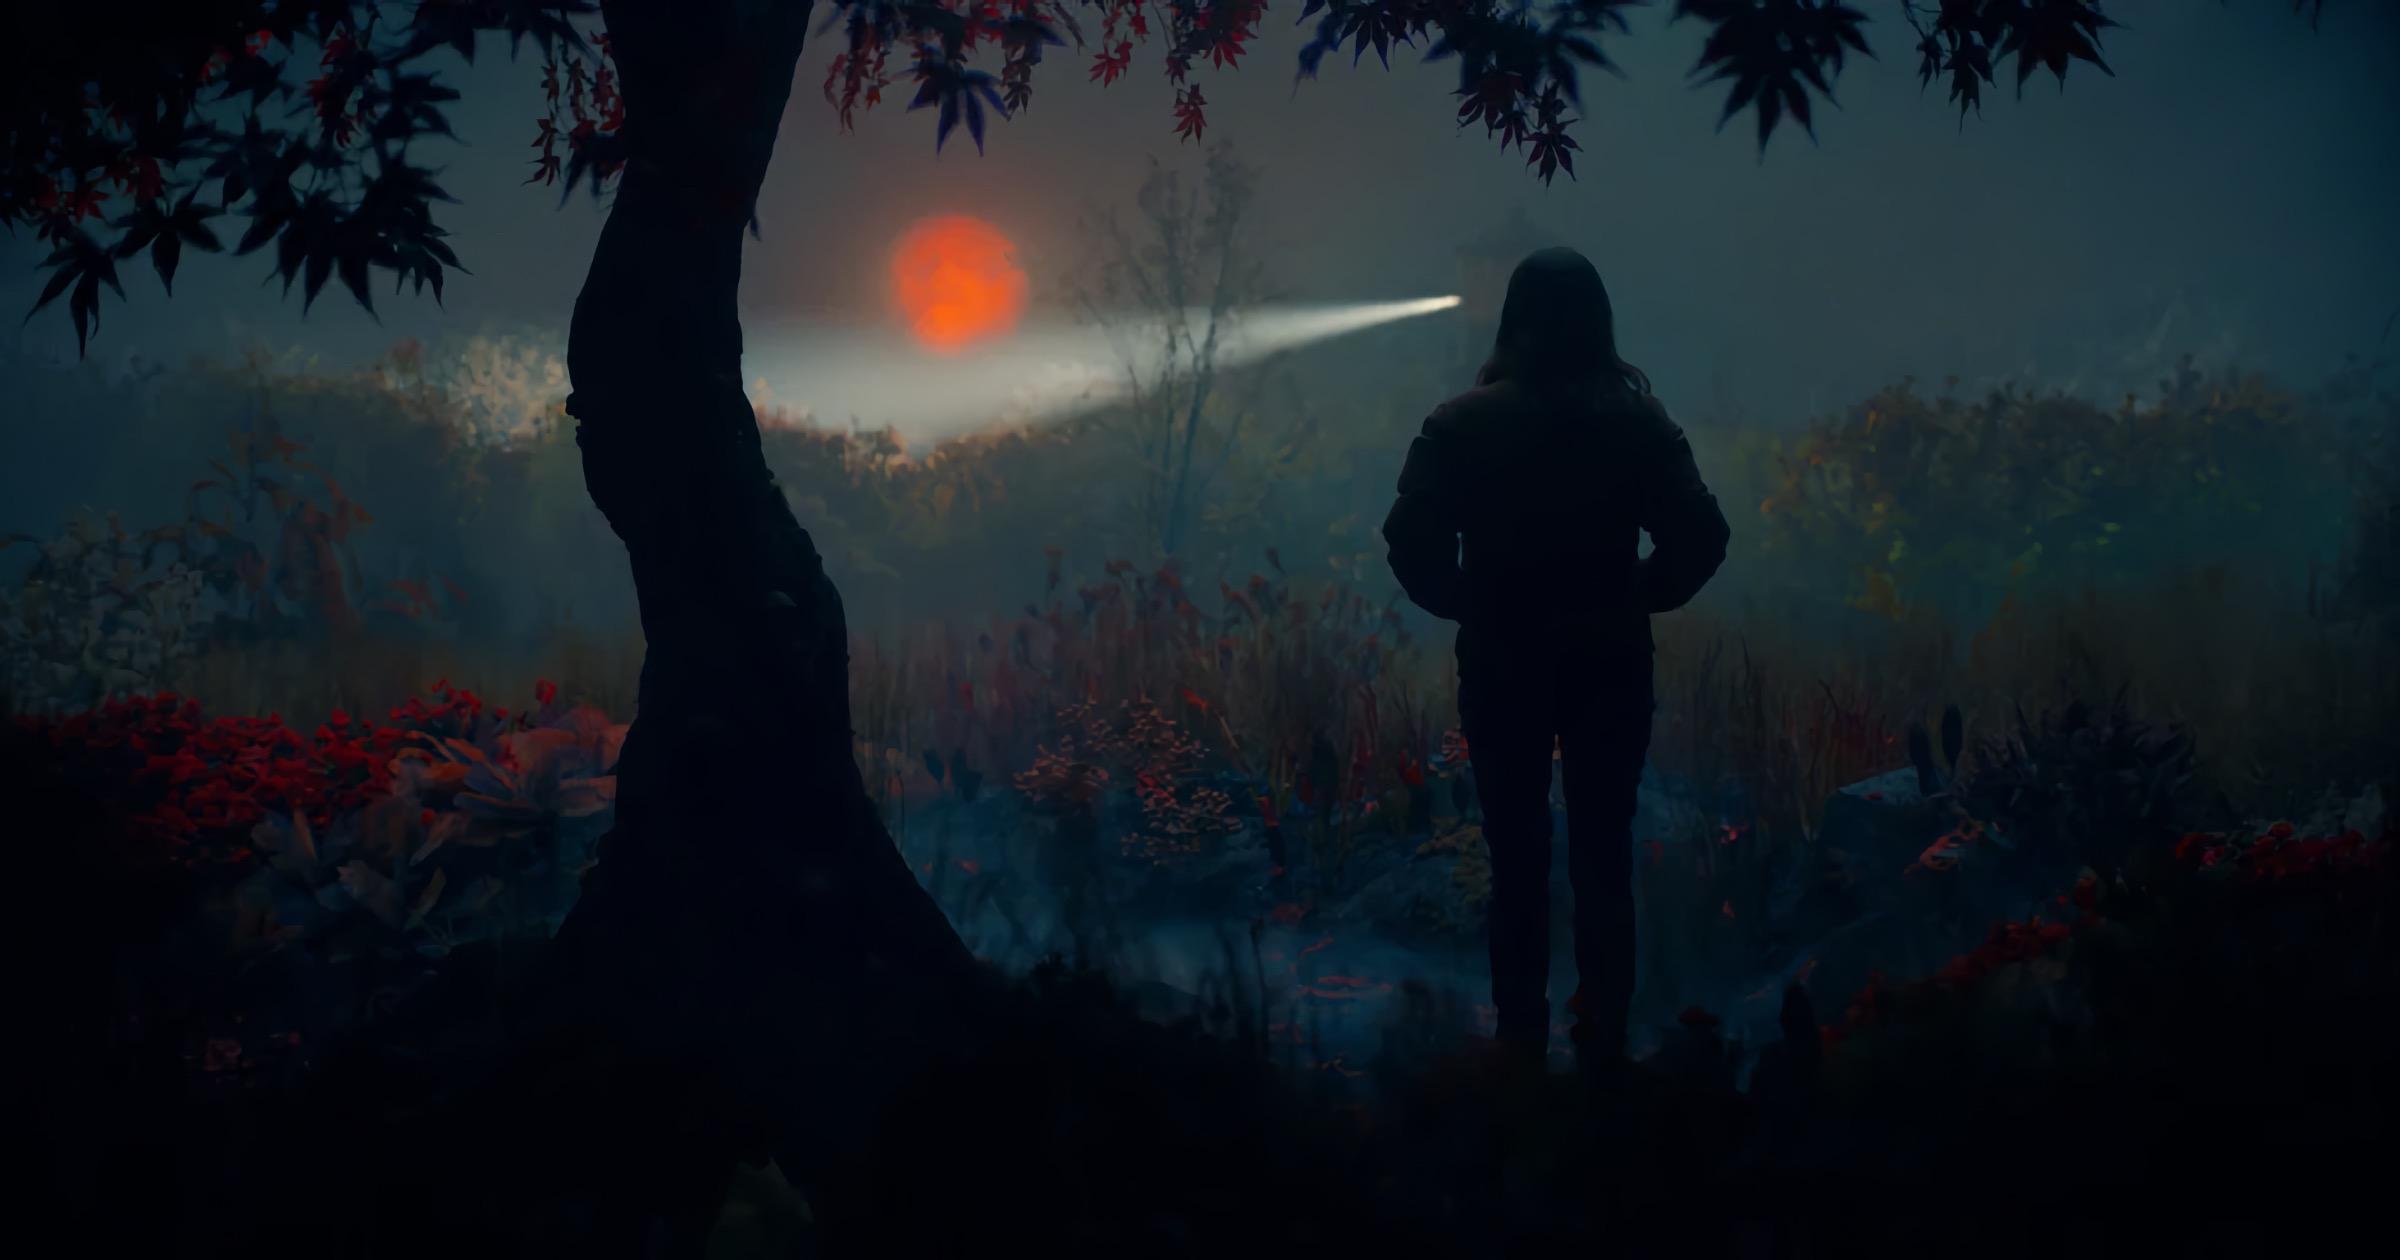 'Lisey's Story' Premieres on Apple TV+